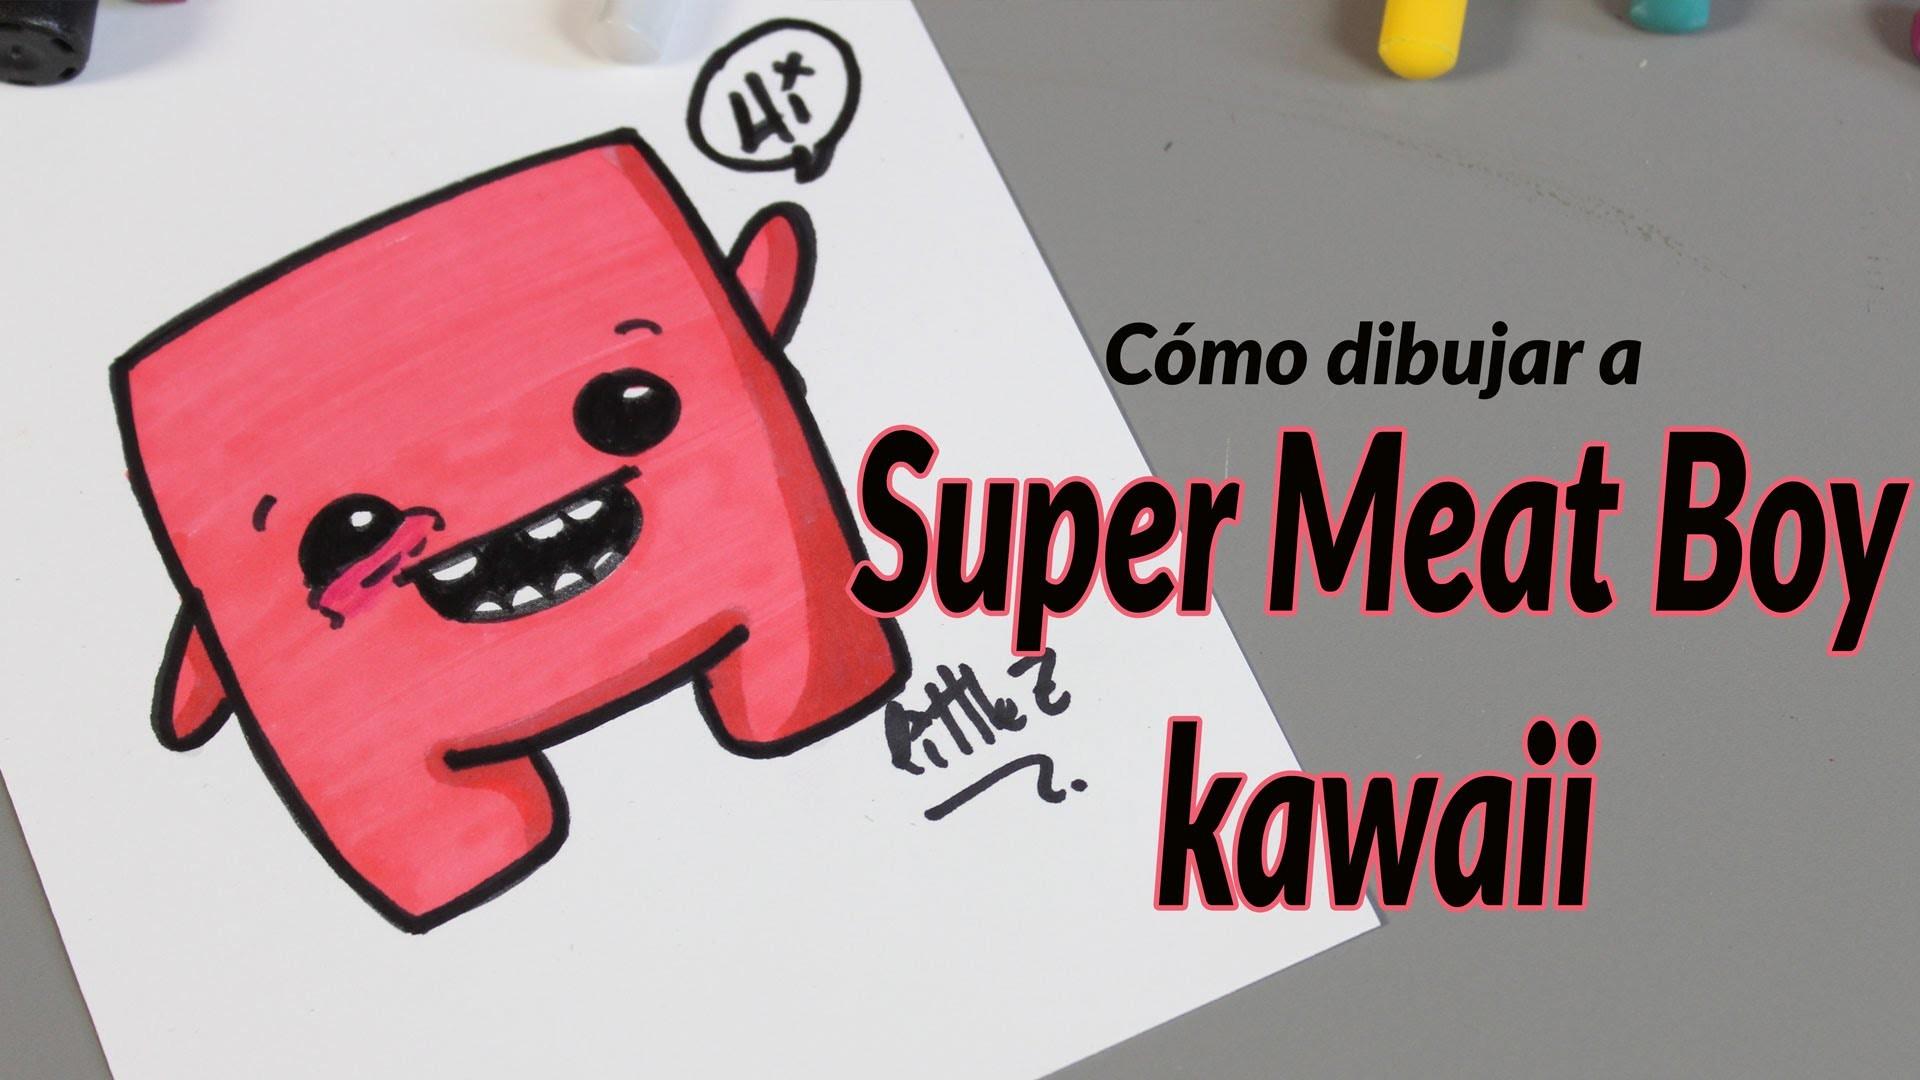 Cómo dibujar a super meet boy kawaii